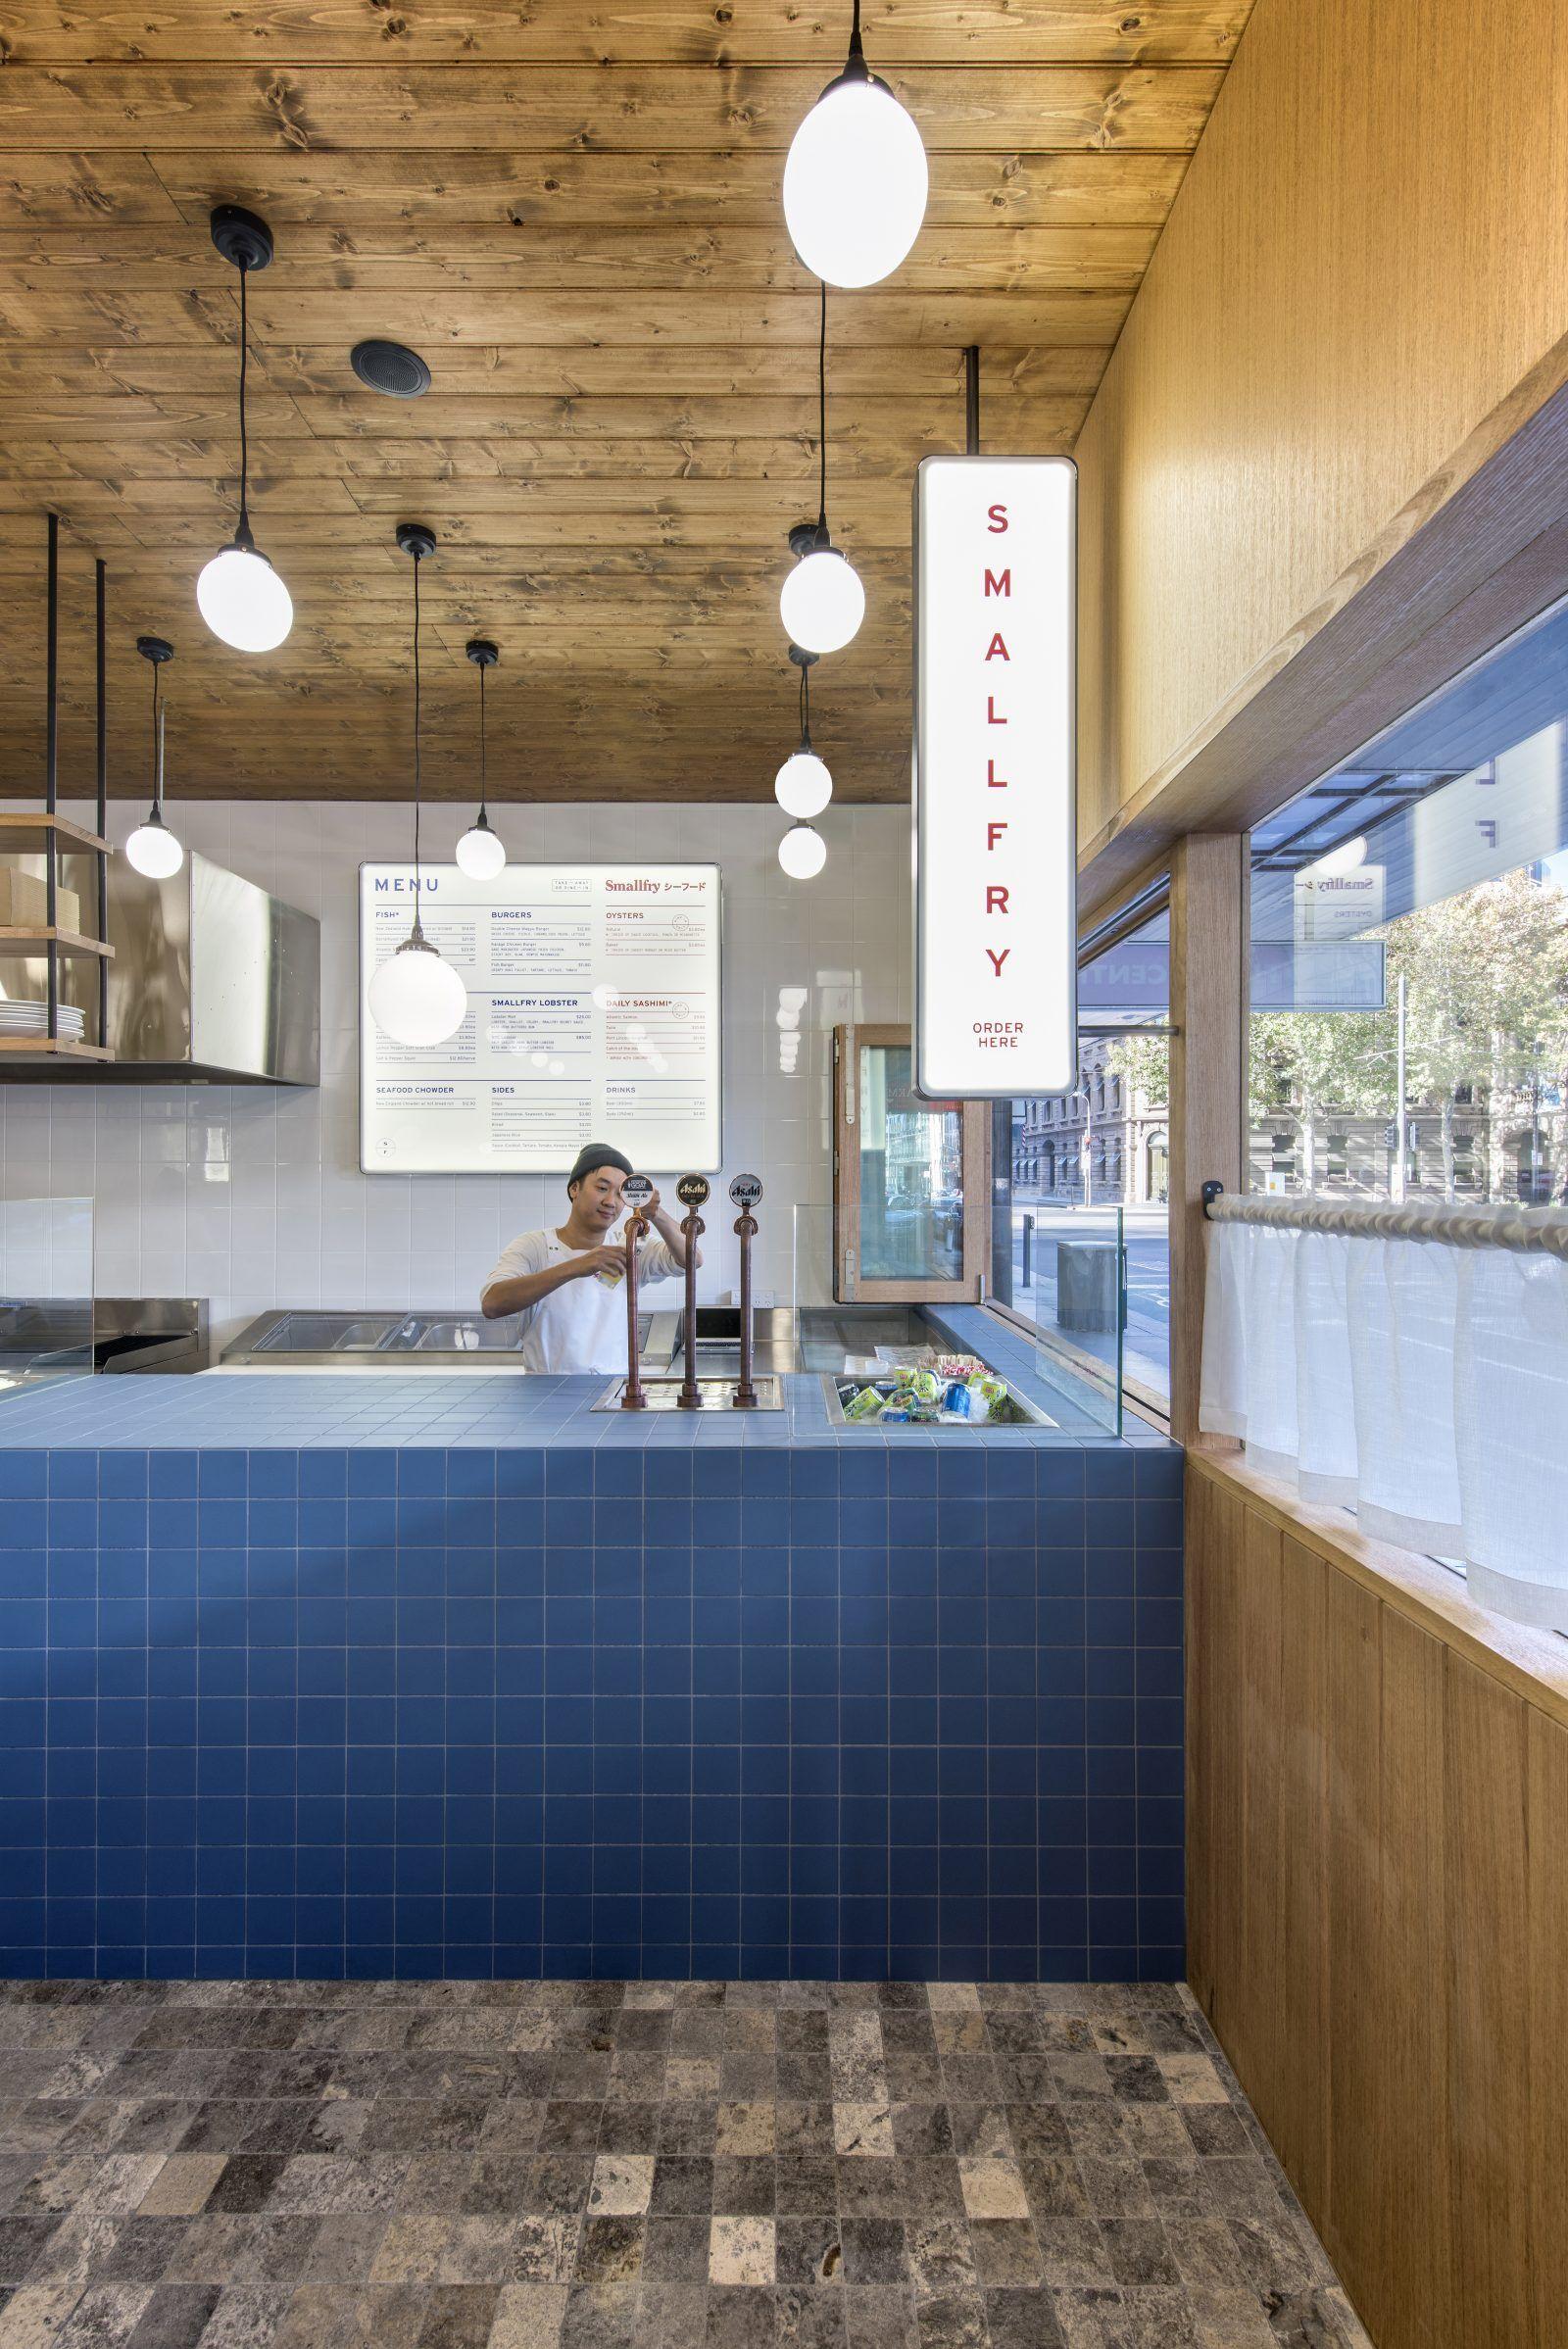 Sans Arc Studio Designs An Off Beat Fish And Chip Bar With A Japanese Twist Shop Interiors Restaurant Design Restaurant Decor